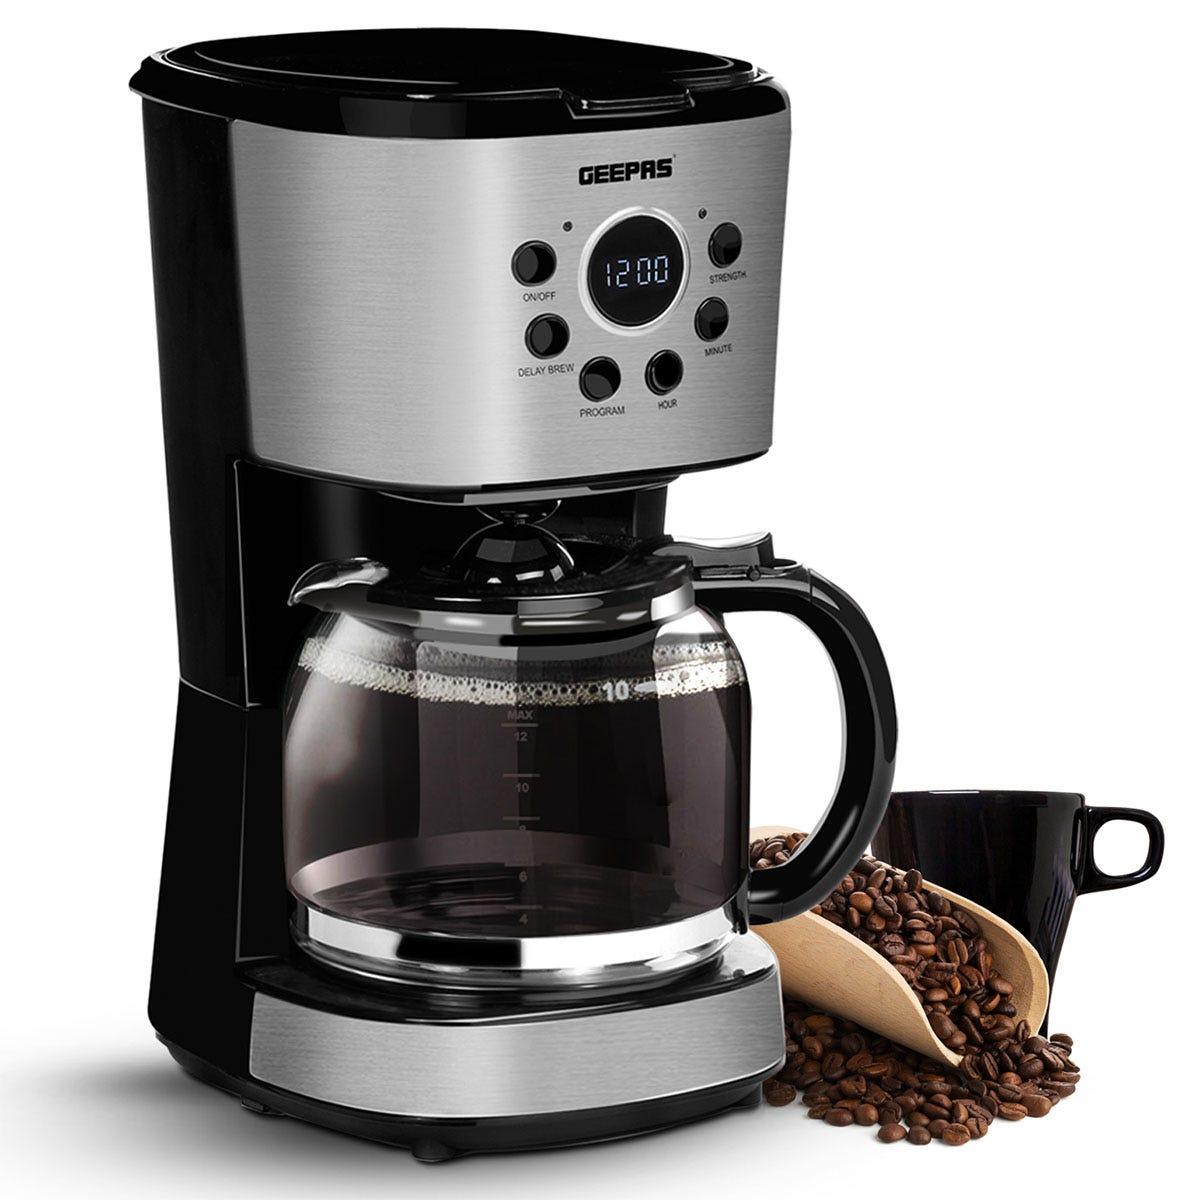 Geepas 1.5L Filter Coffee Machine - Black & Silver